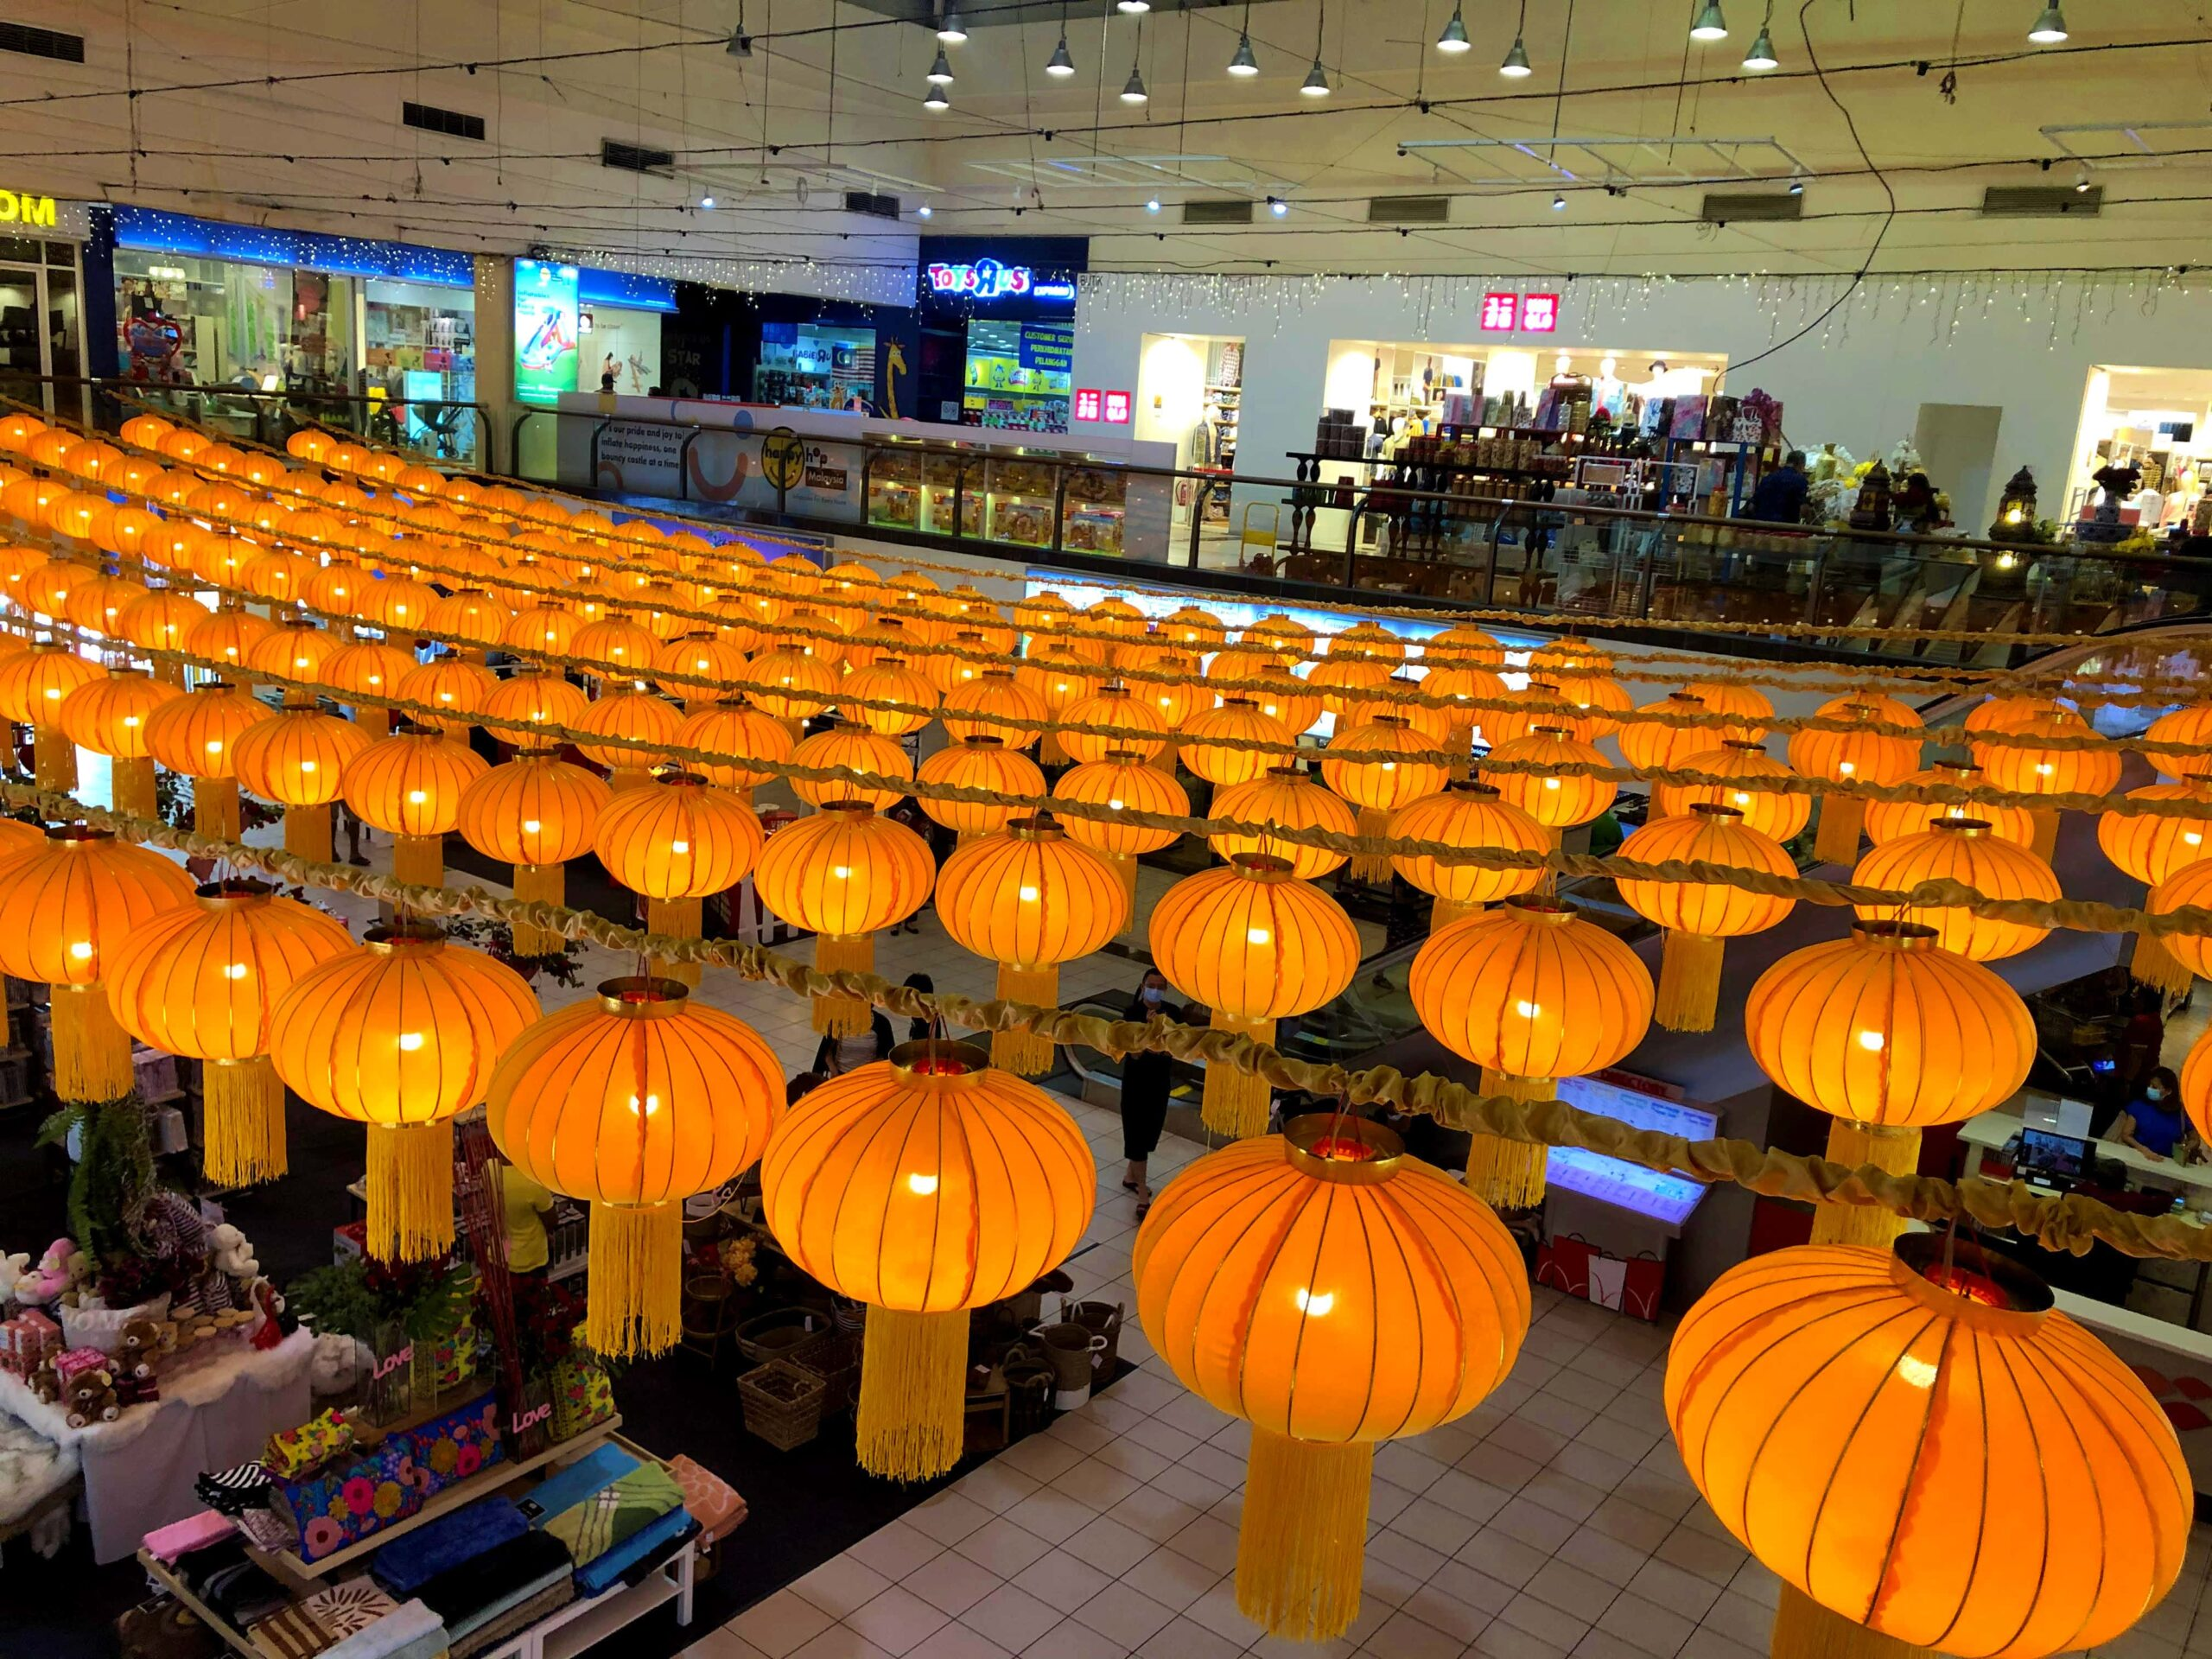 bangsar village chinese new year